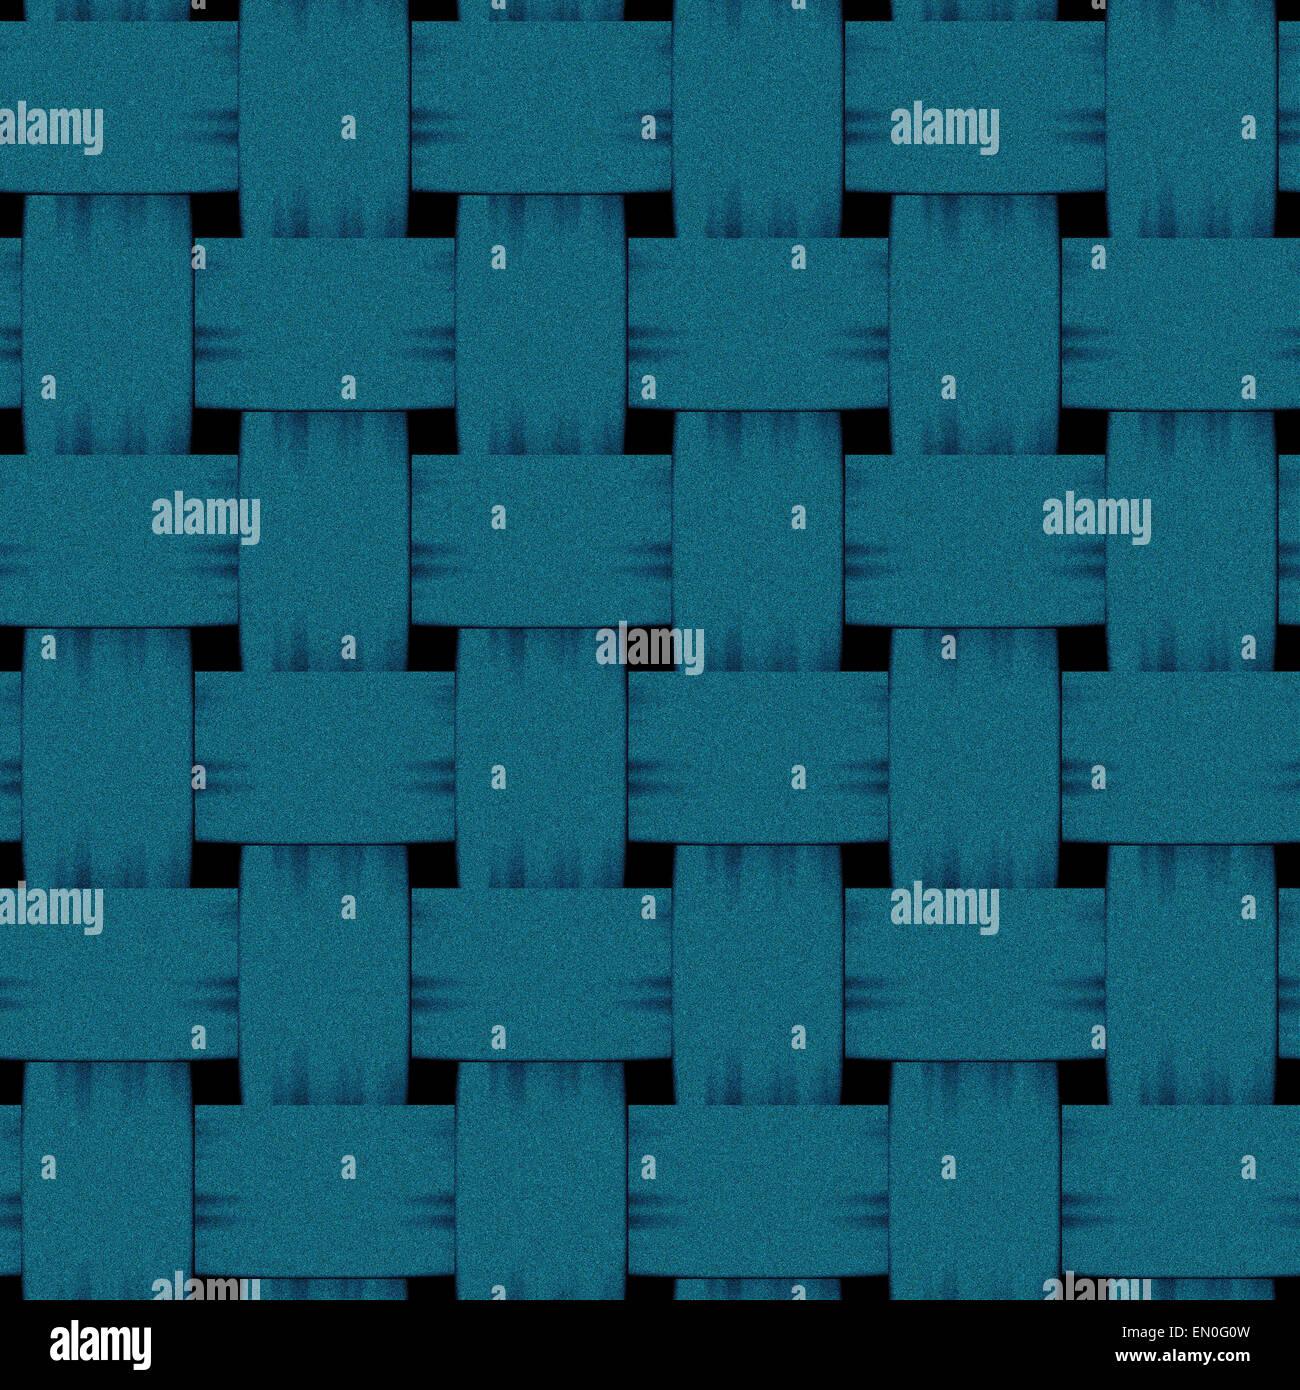 Cuadrado azul tejido entrelazado prestados denim Imagen De Stock